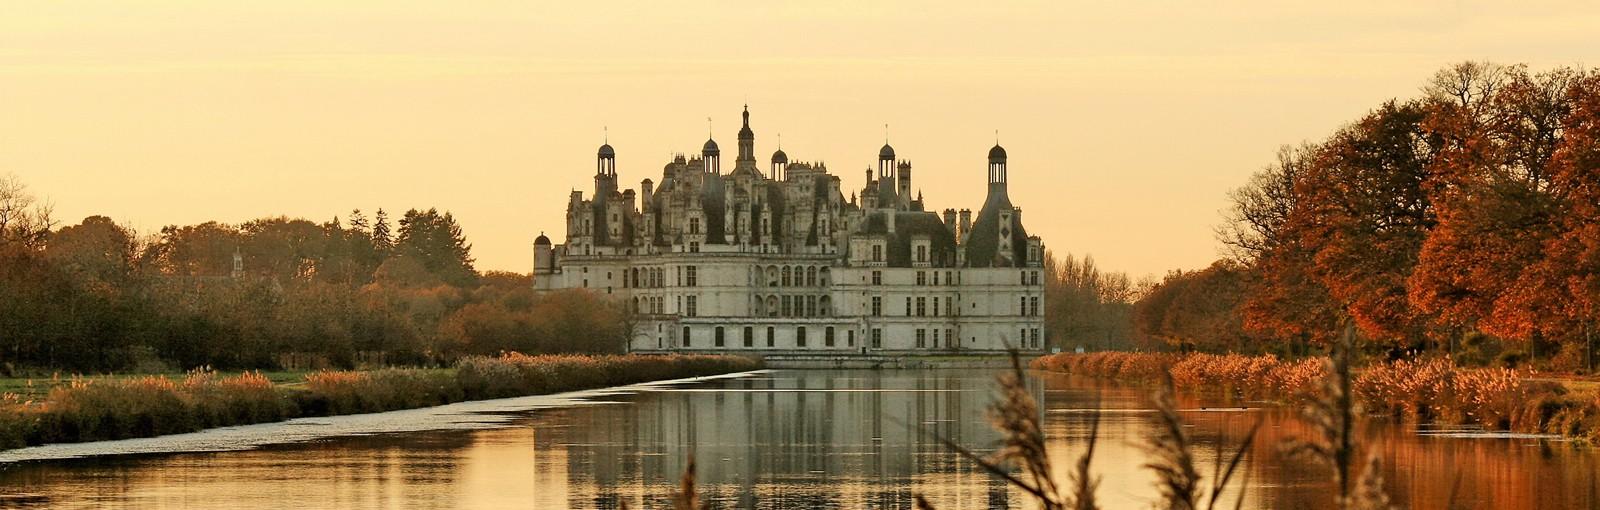 Tours 香波堡-舍农索城堡-谢韦尔尼城堡或肖蒙城堡或布洛瓦城堡 - 一日游 - 从巴黎出发的一日游